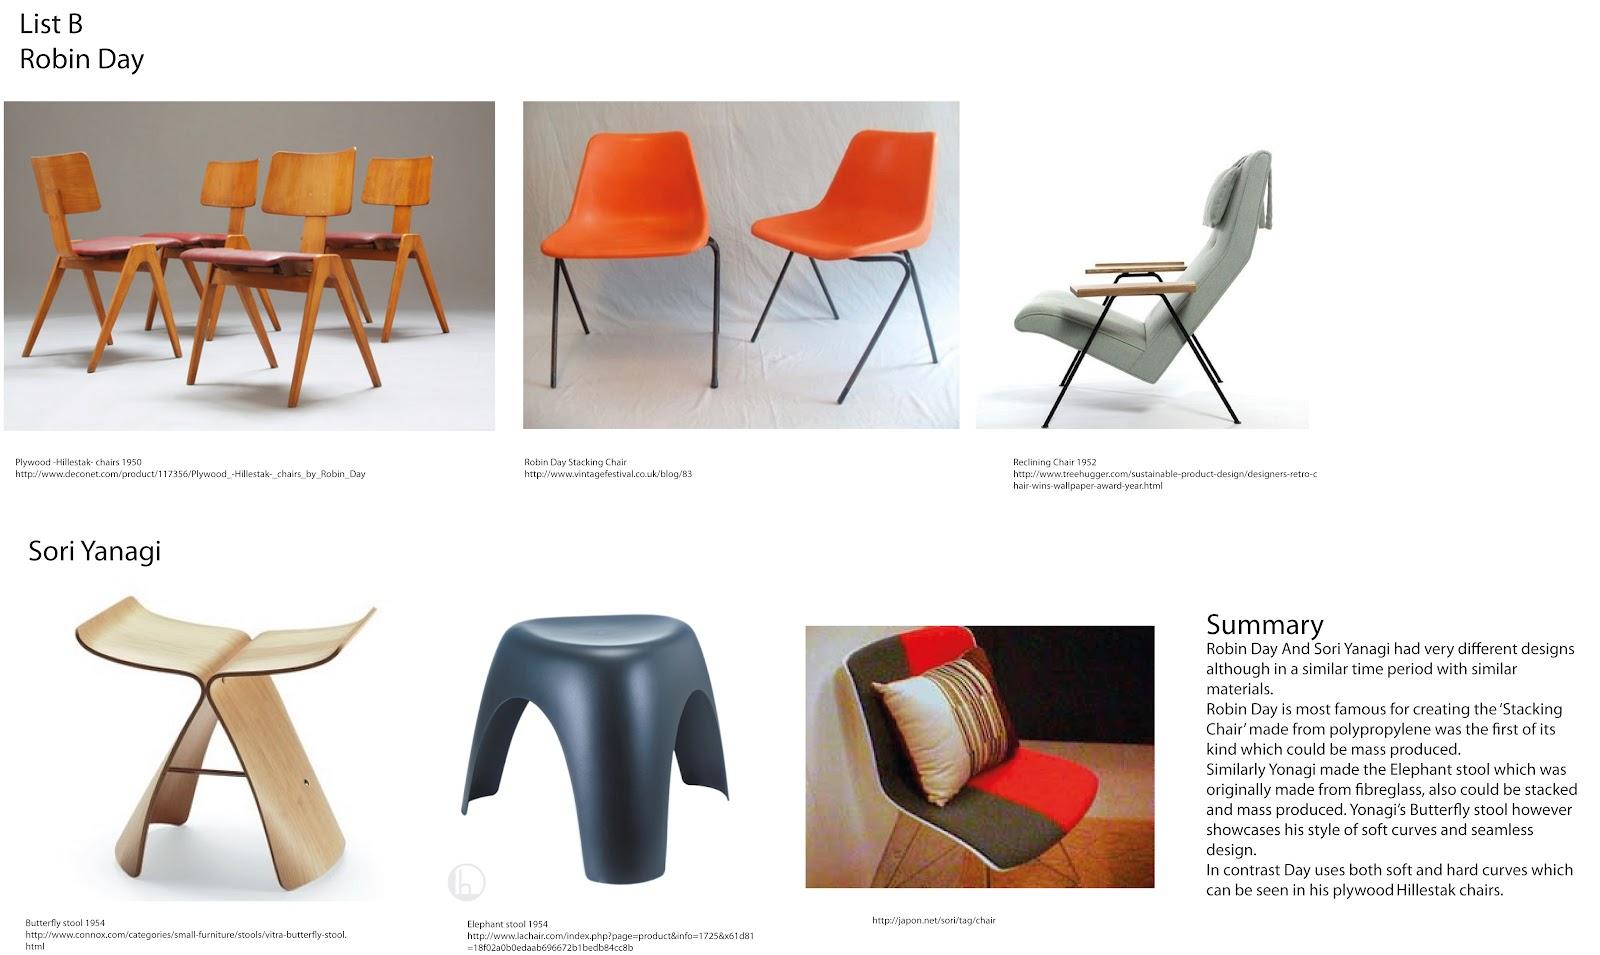 Pleasant Zac Douglas Furniture Design March 2012 Machost Co Dining Chair Design Ideas Machostcouk